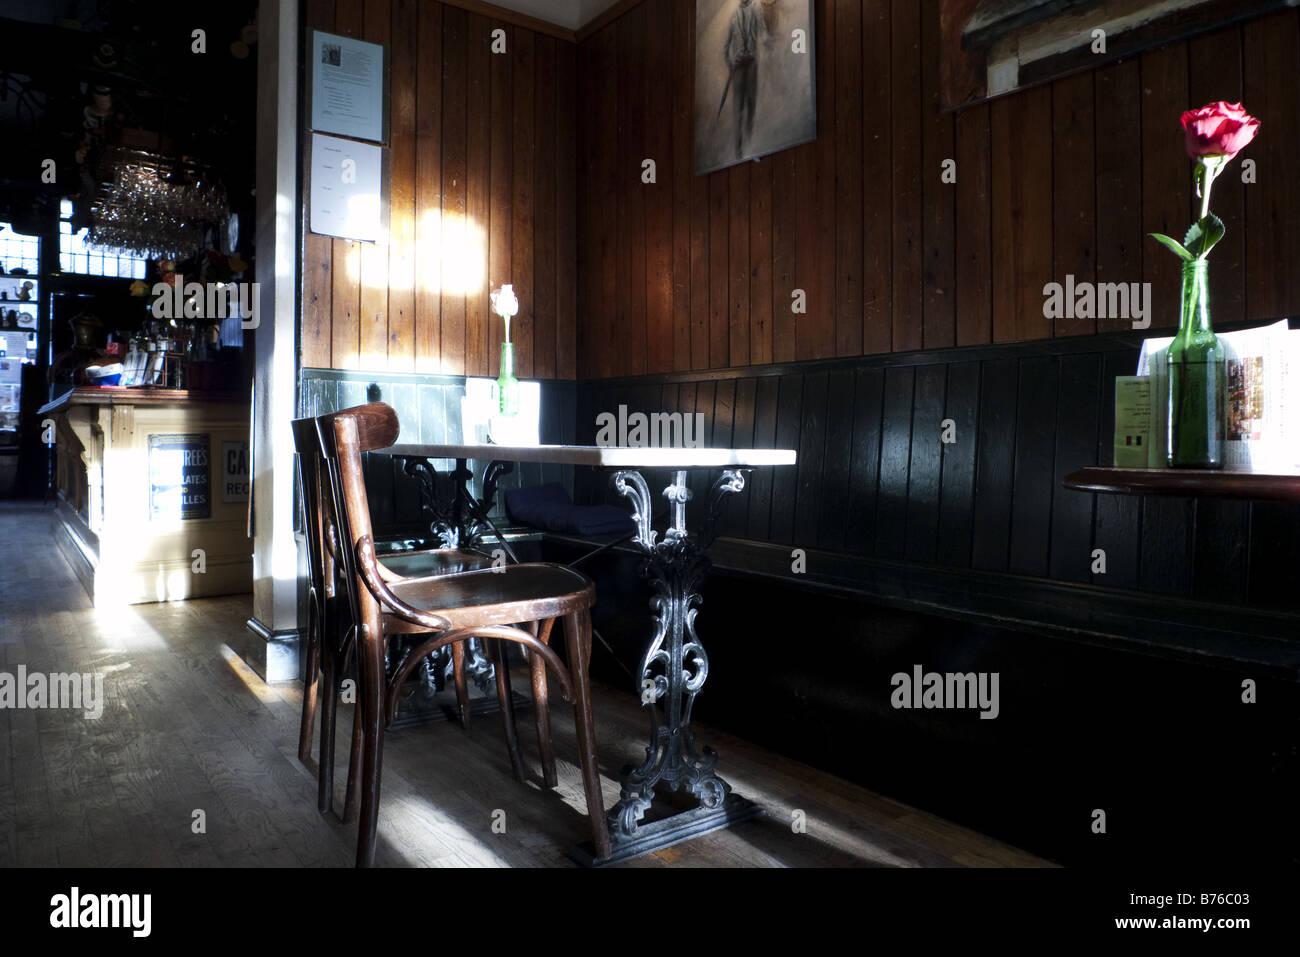 Troubadour Cafe Stock Photo: 21654083 - Alamy